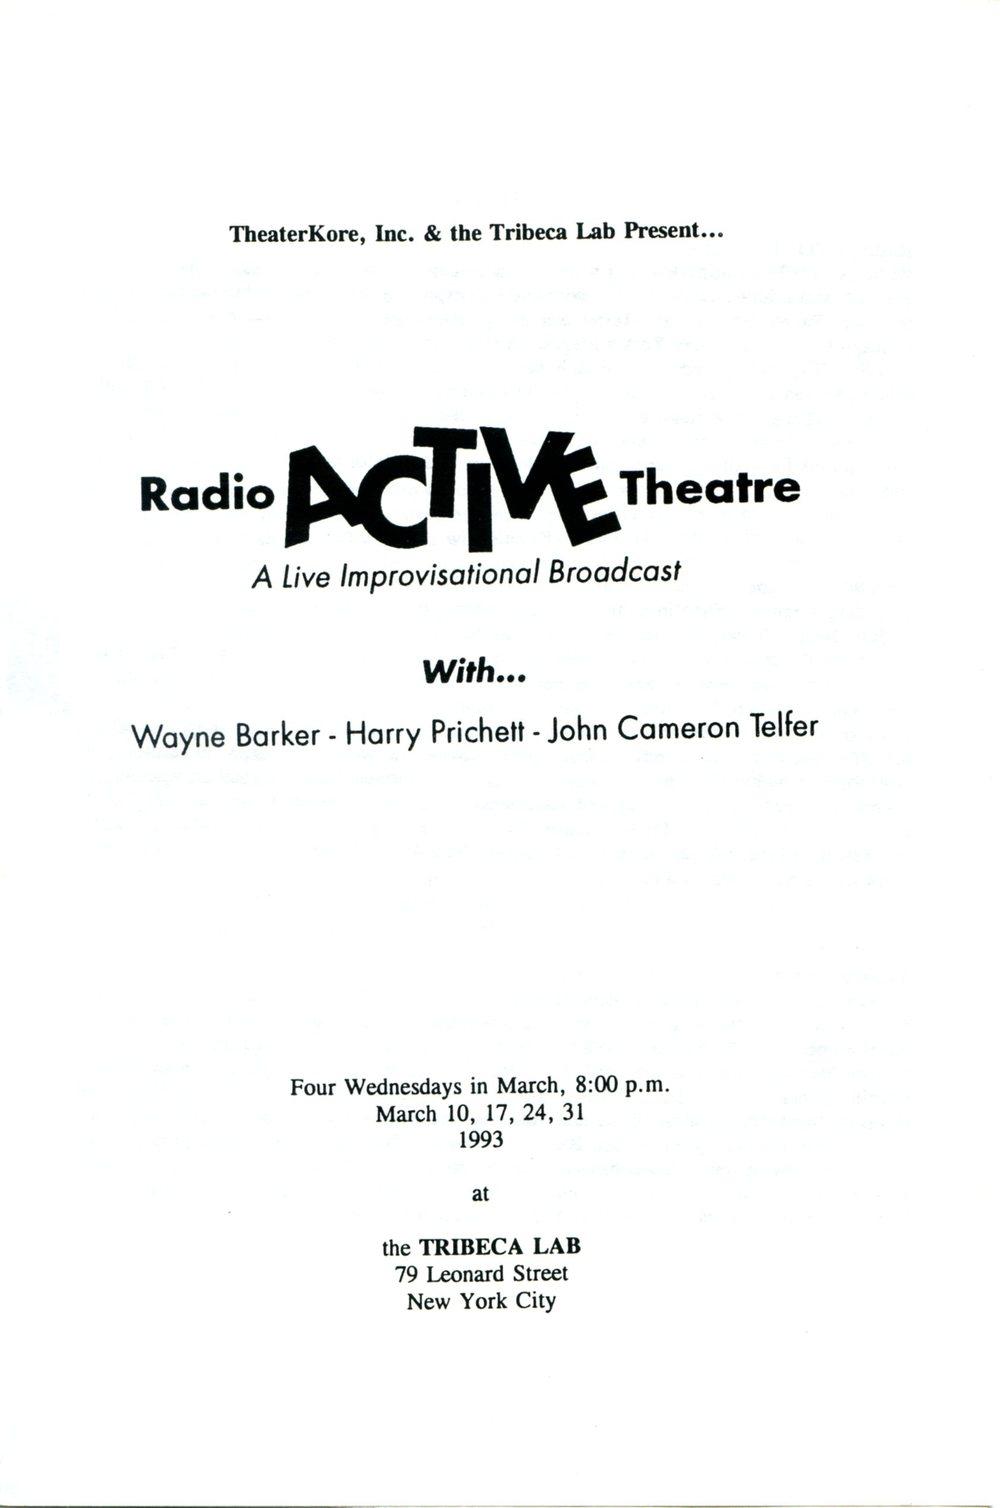 prg_Radioactive theater001.jpg